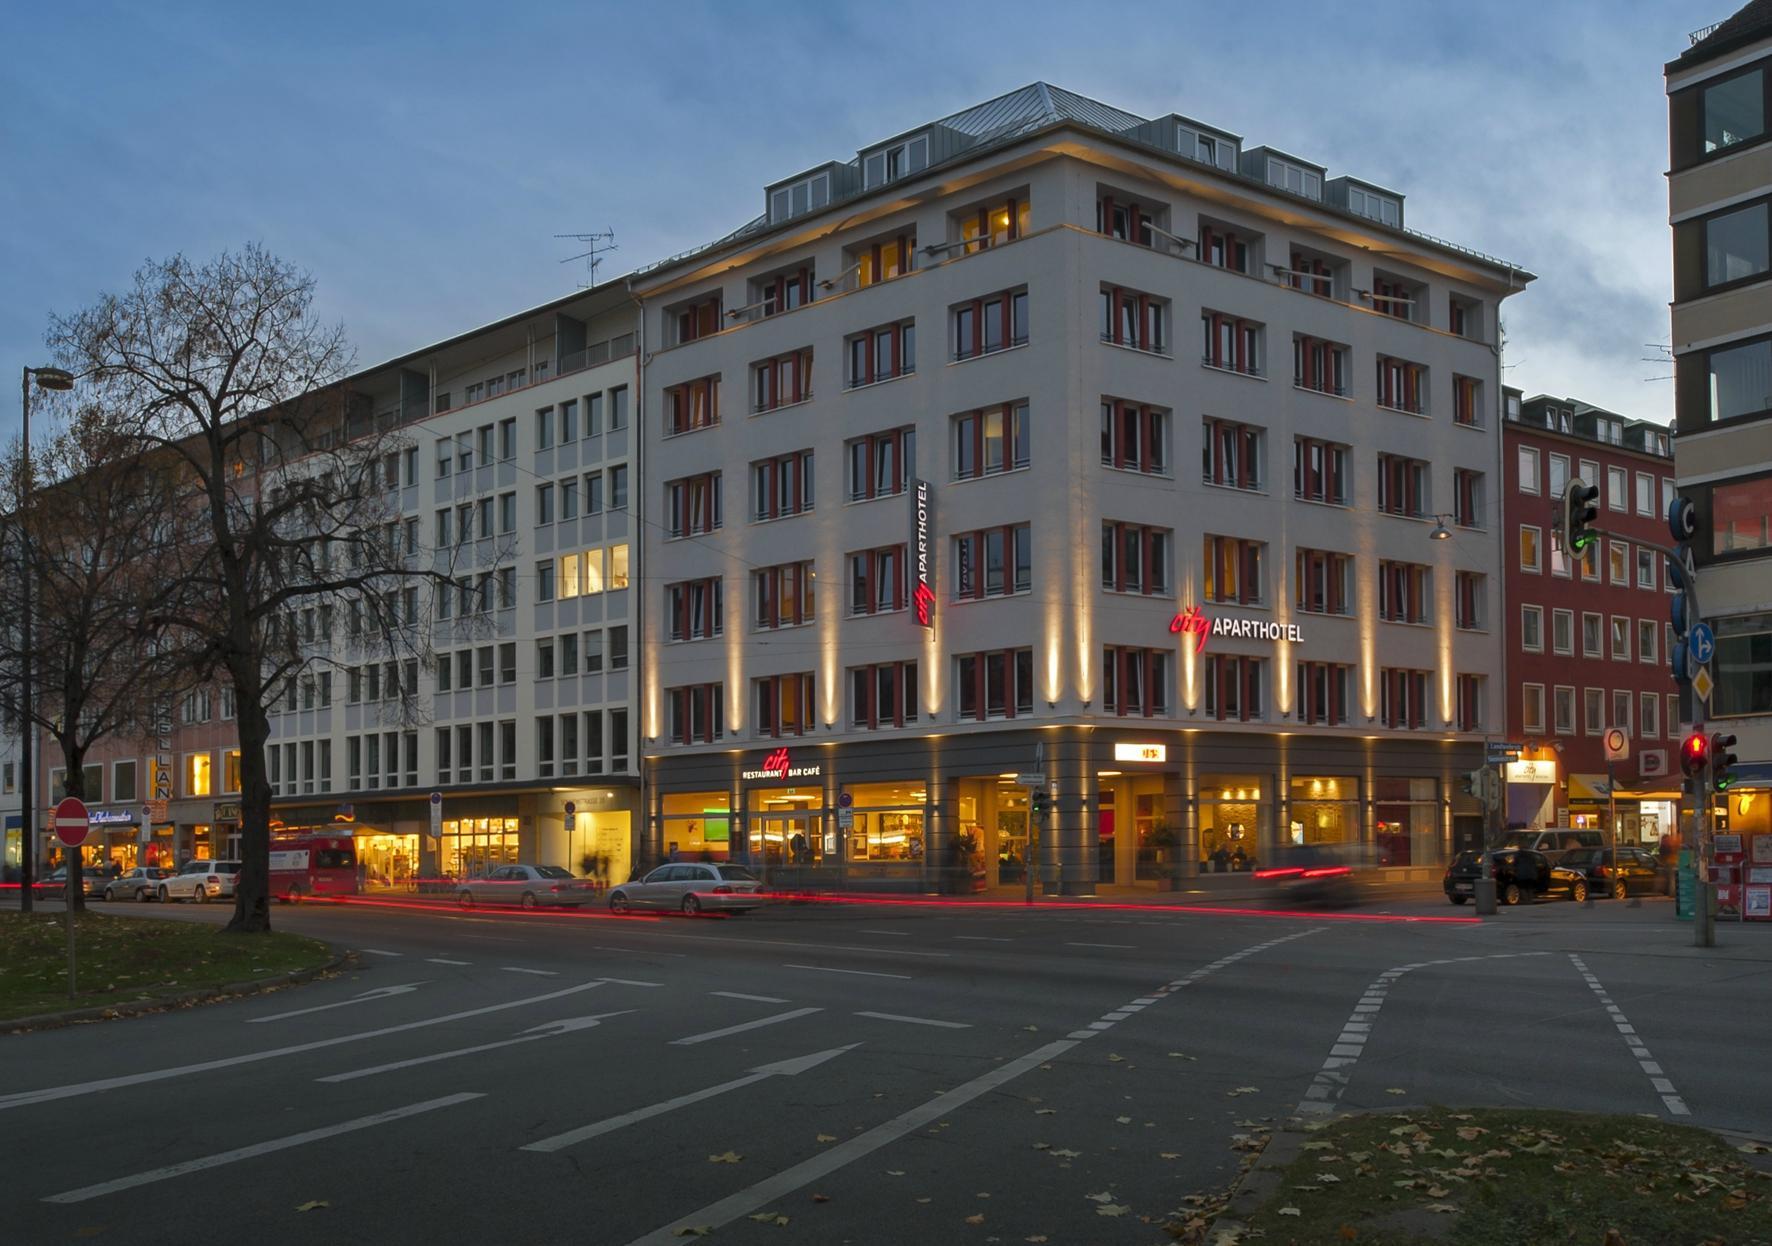 City Aparthotel Munich